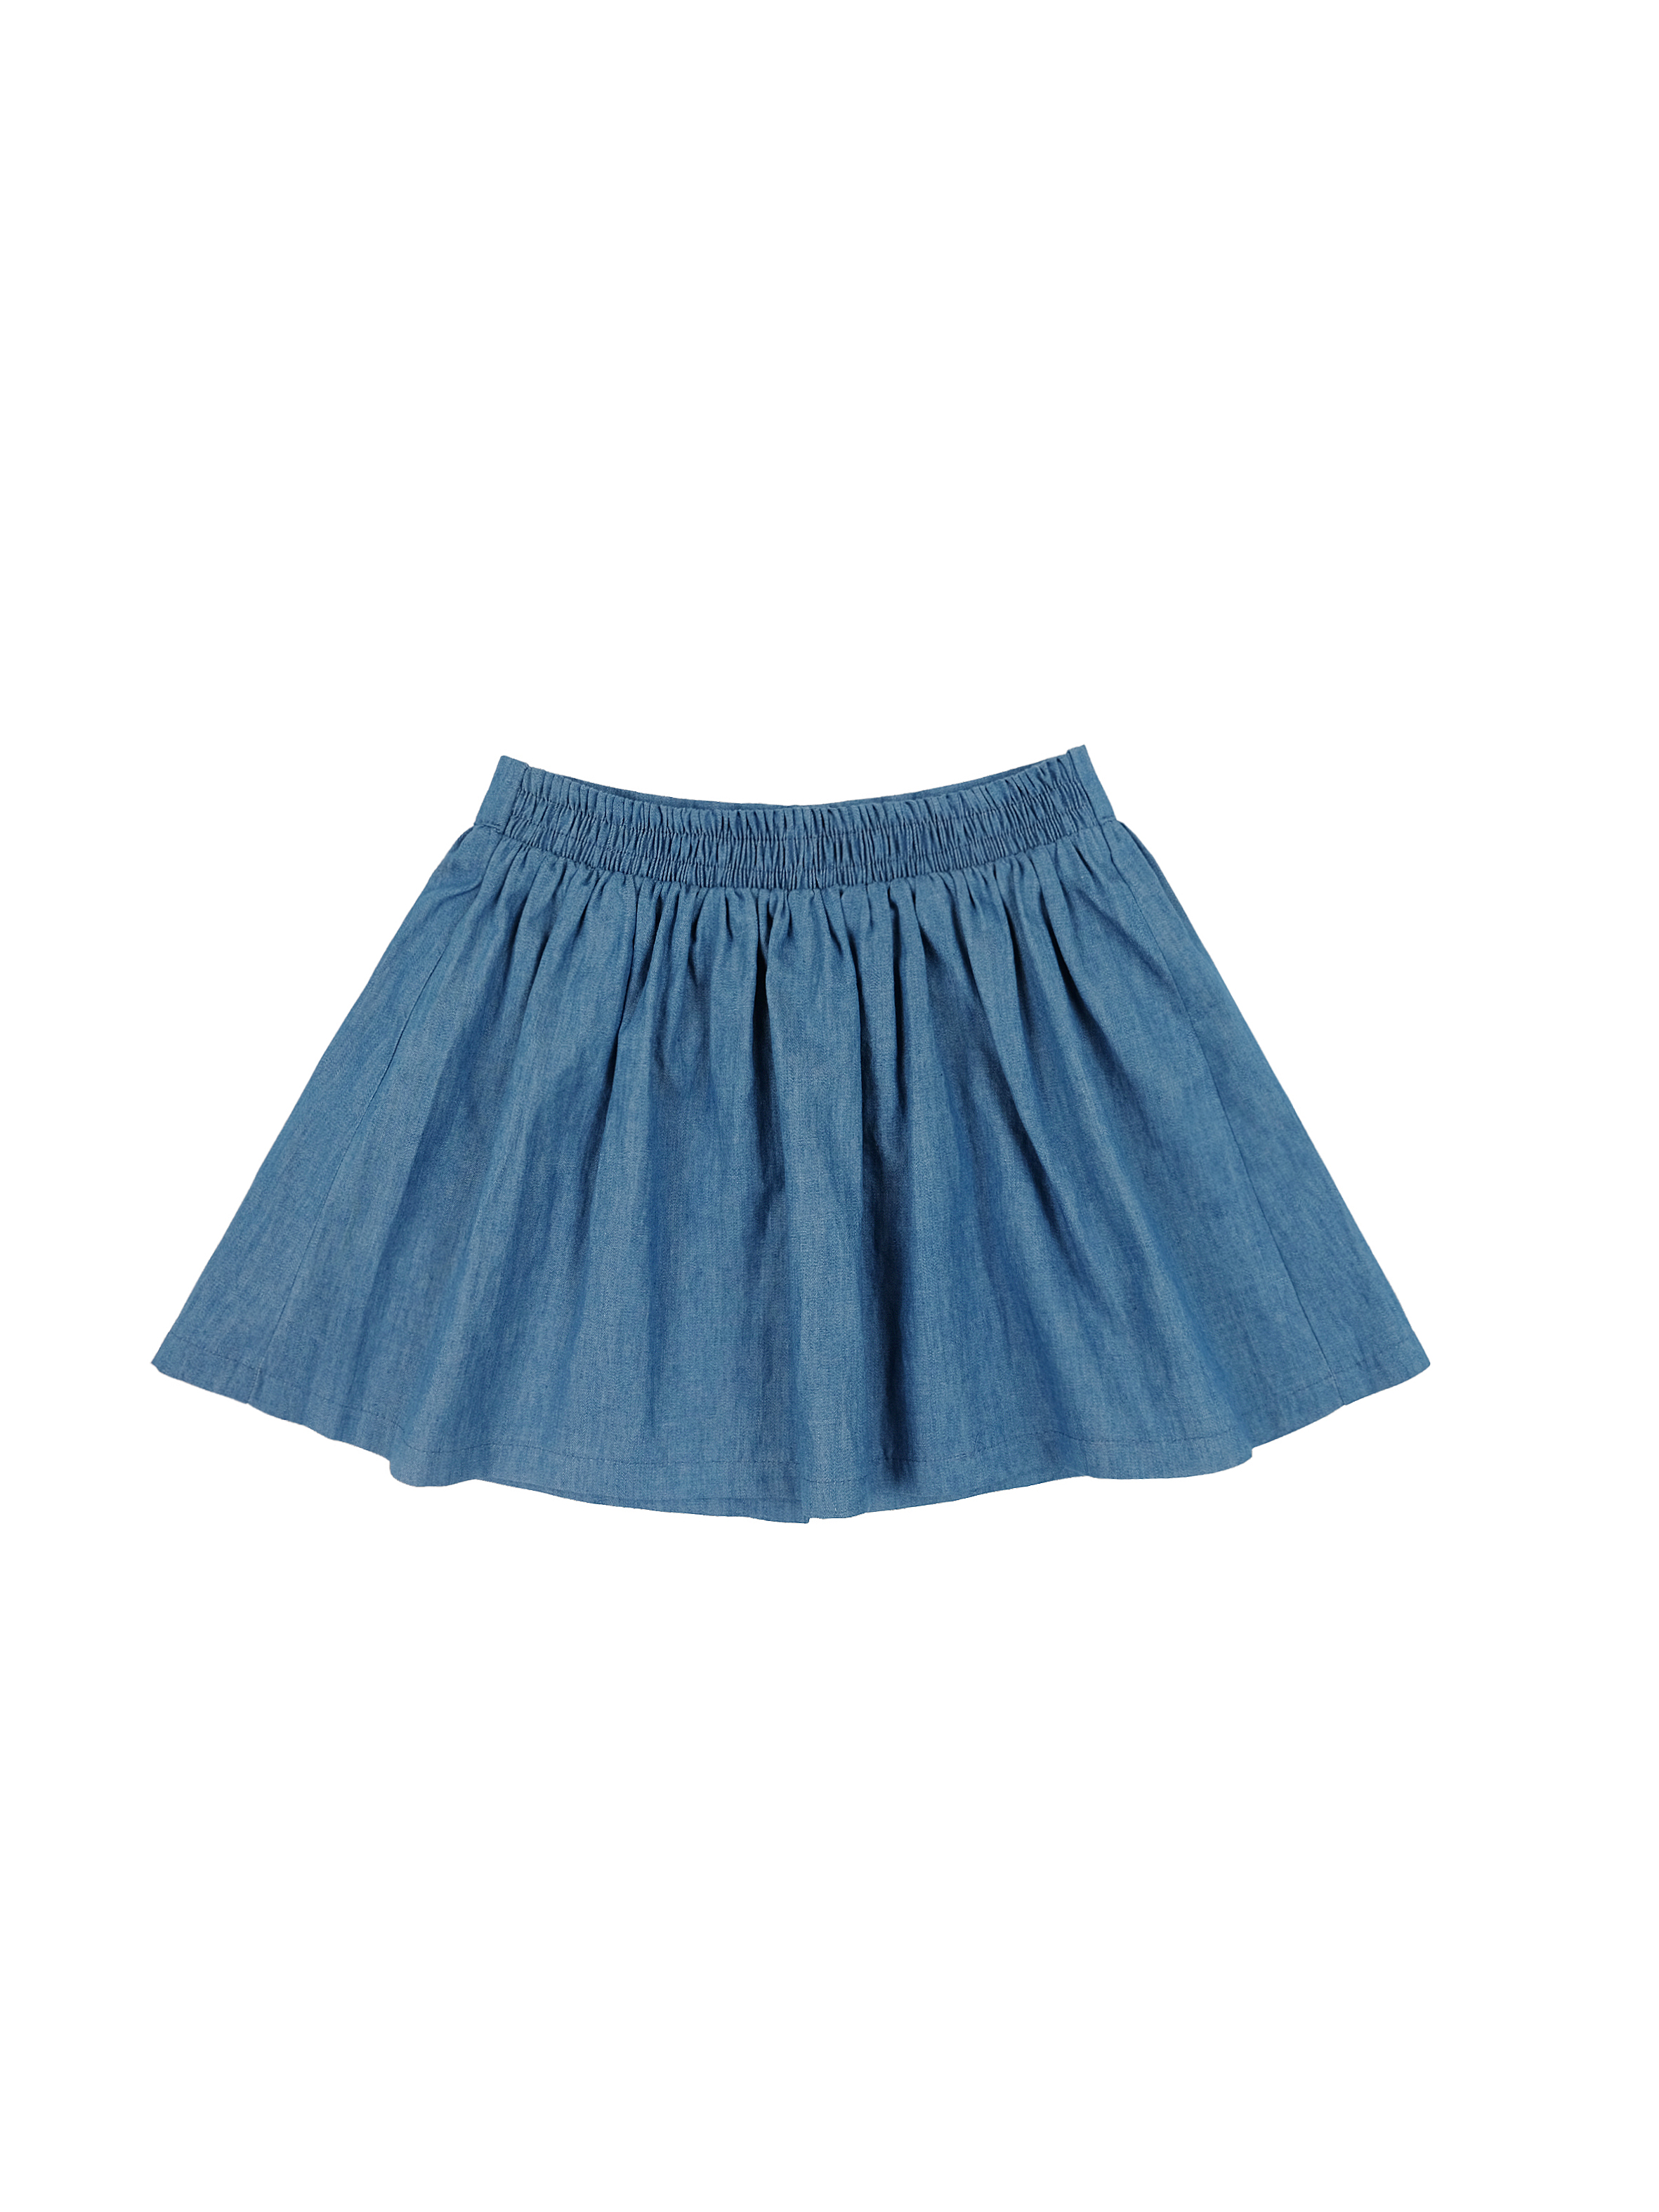 Юбка для девочки Reike blue jeans, RKS003SS20ICC blue jeans, 92-52 24 мес.